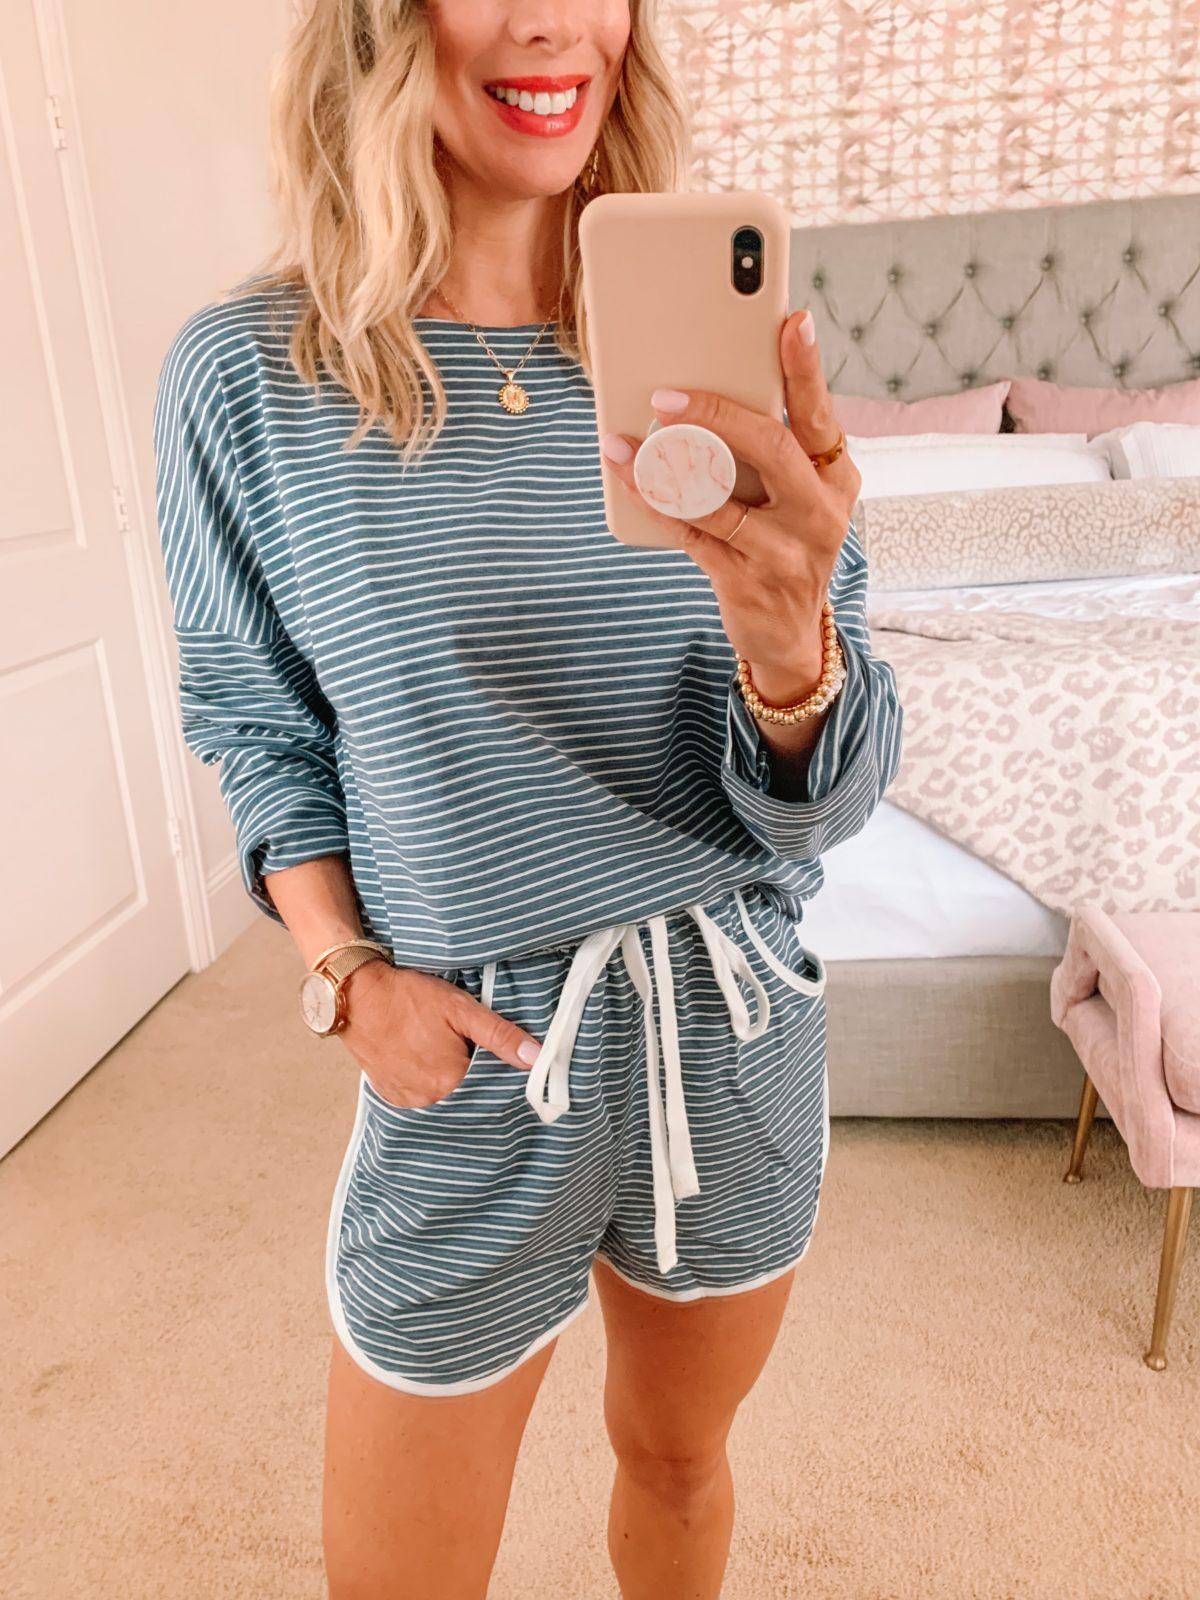 Amazon Fashion Faves, Pajamas and Slippers